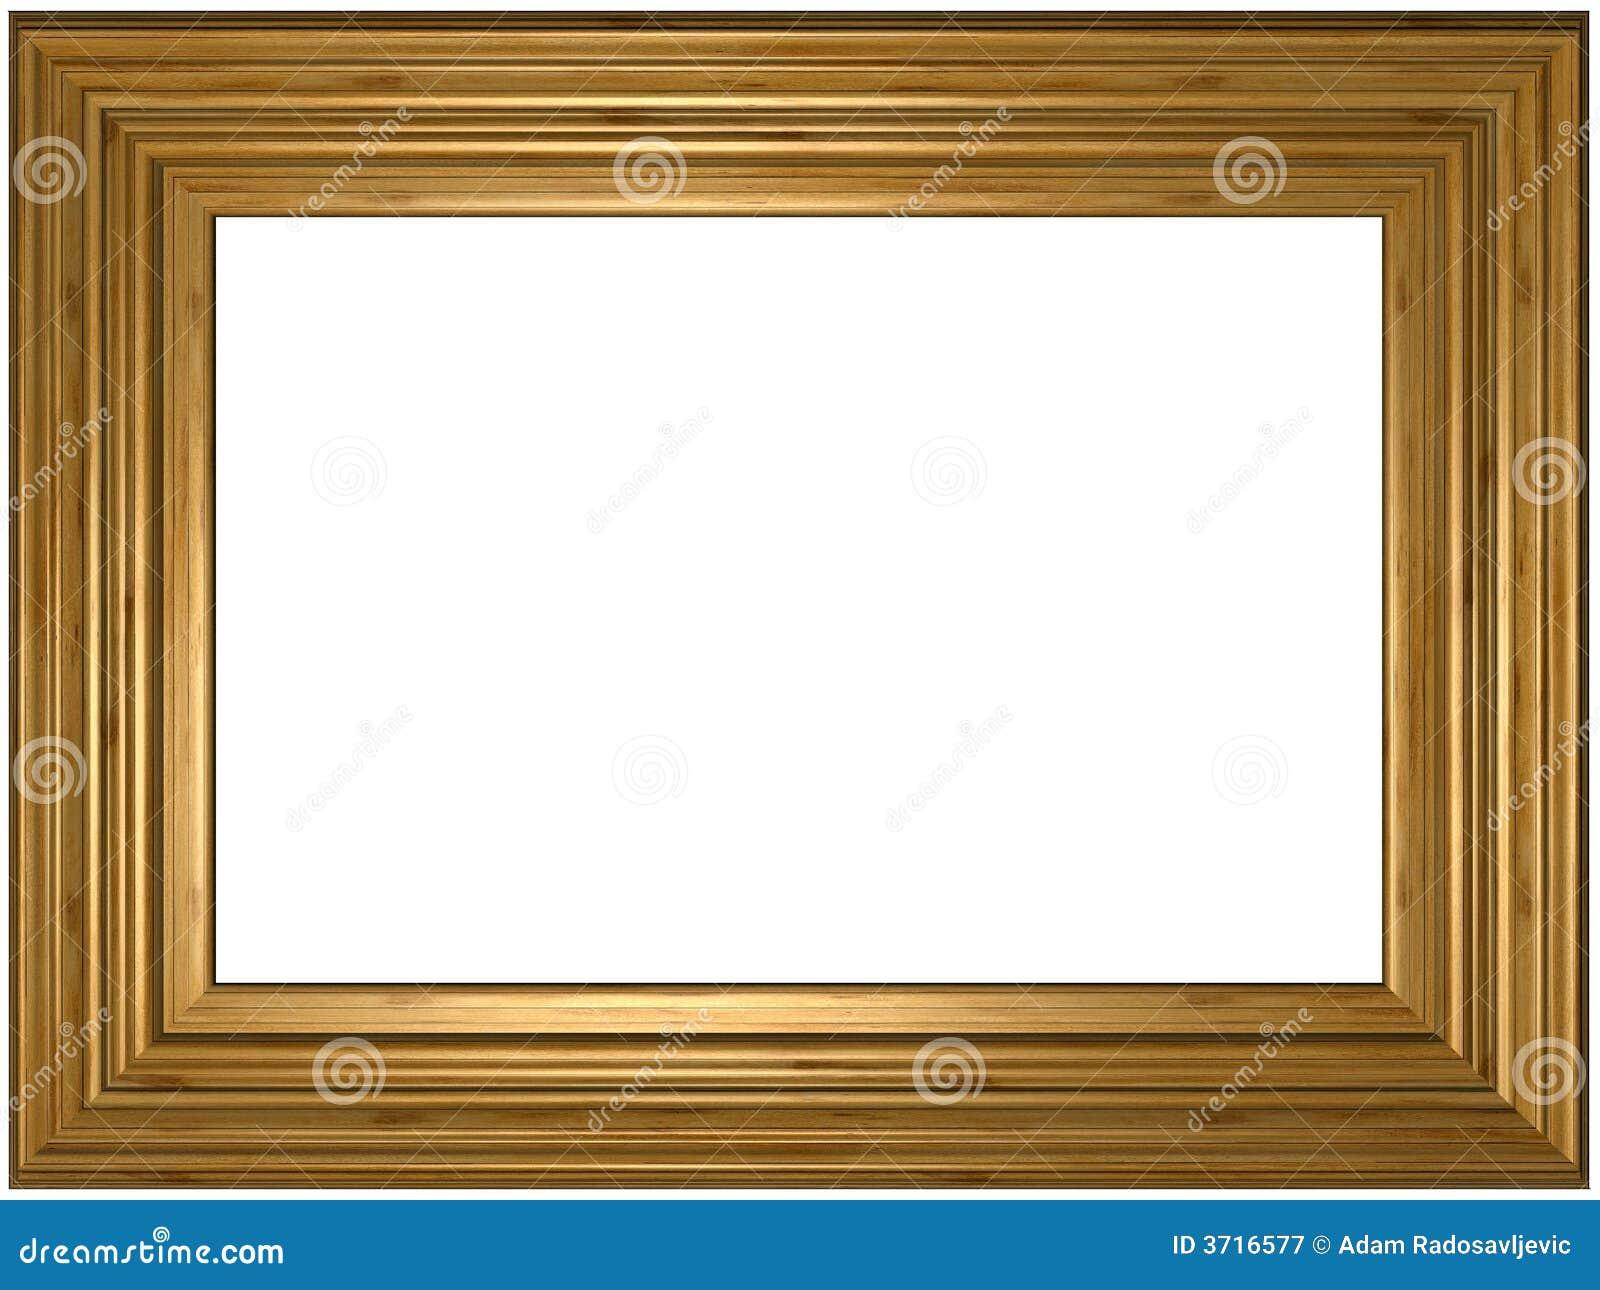 Kunst-Bilderrahmen stockbild. Bild von leere, haupt, möbel - 3716577